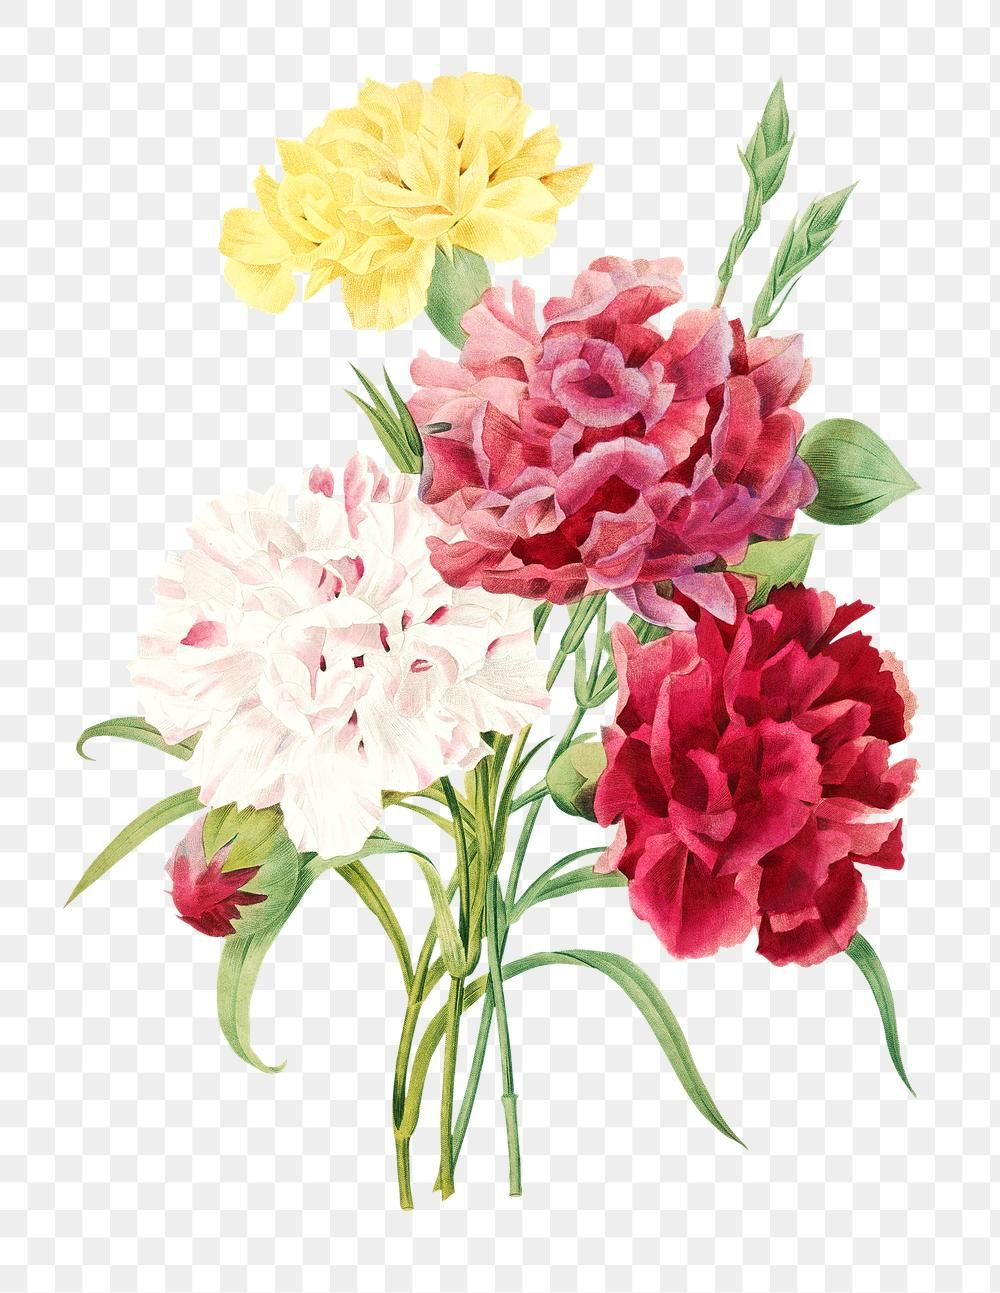 Carnation Flowers Sticker Overlay Design Element Free Image By Rawpixel Com Gade Flower Illustration Carnations Paper Texture Background Design